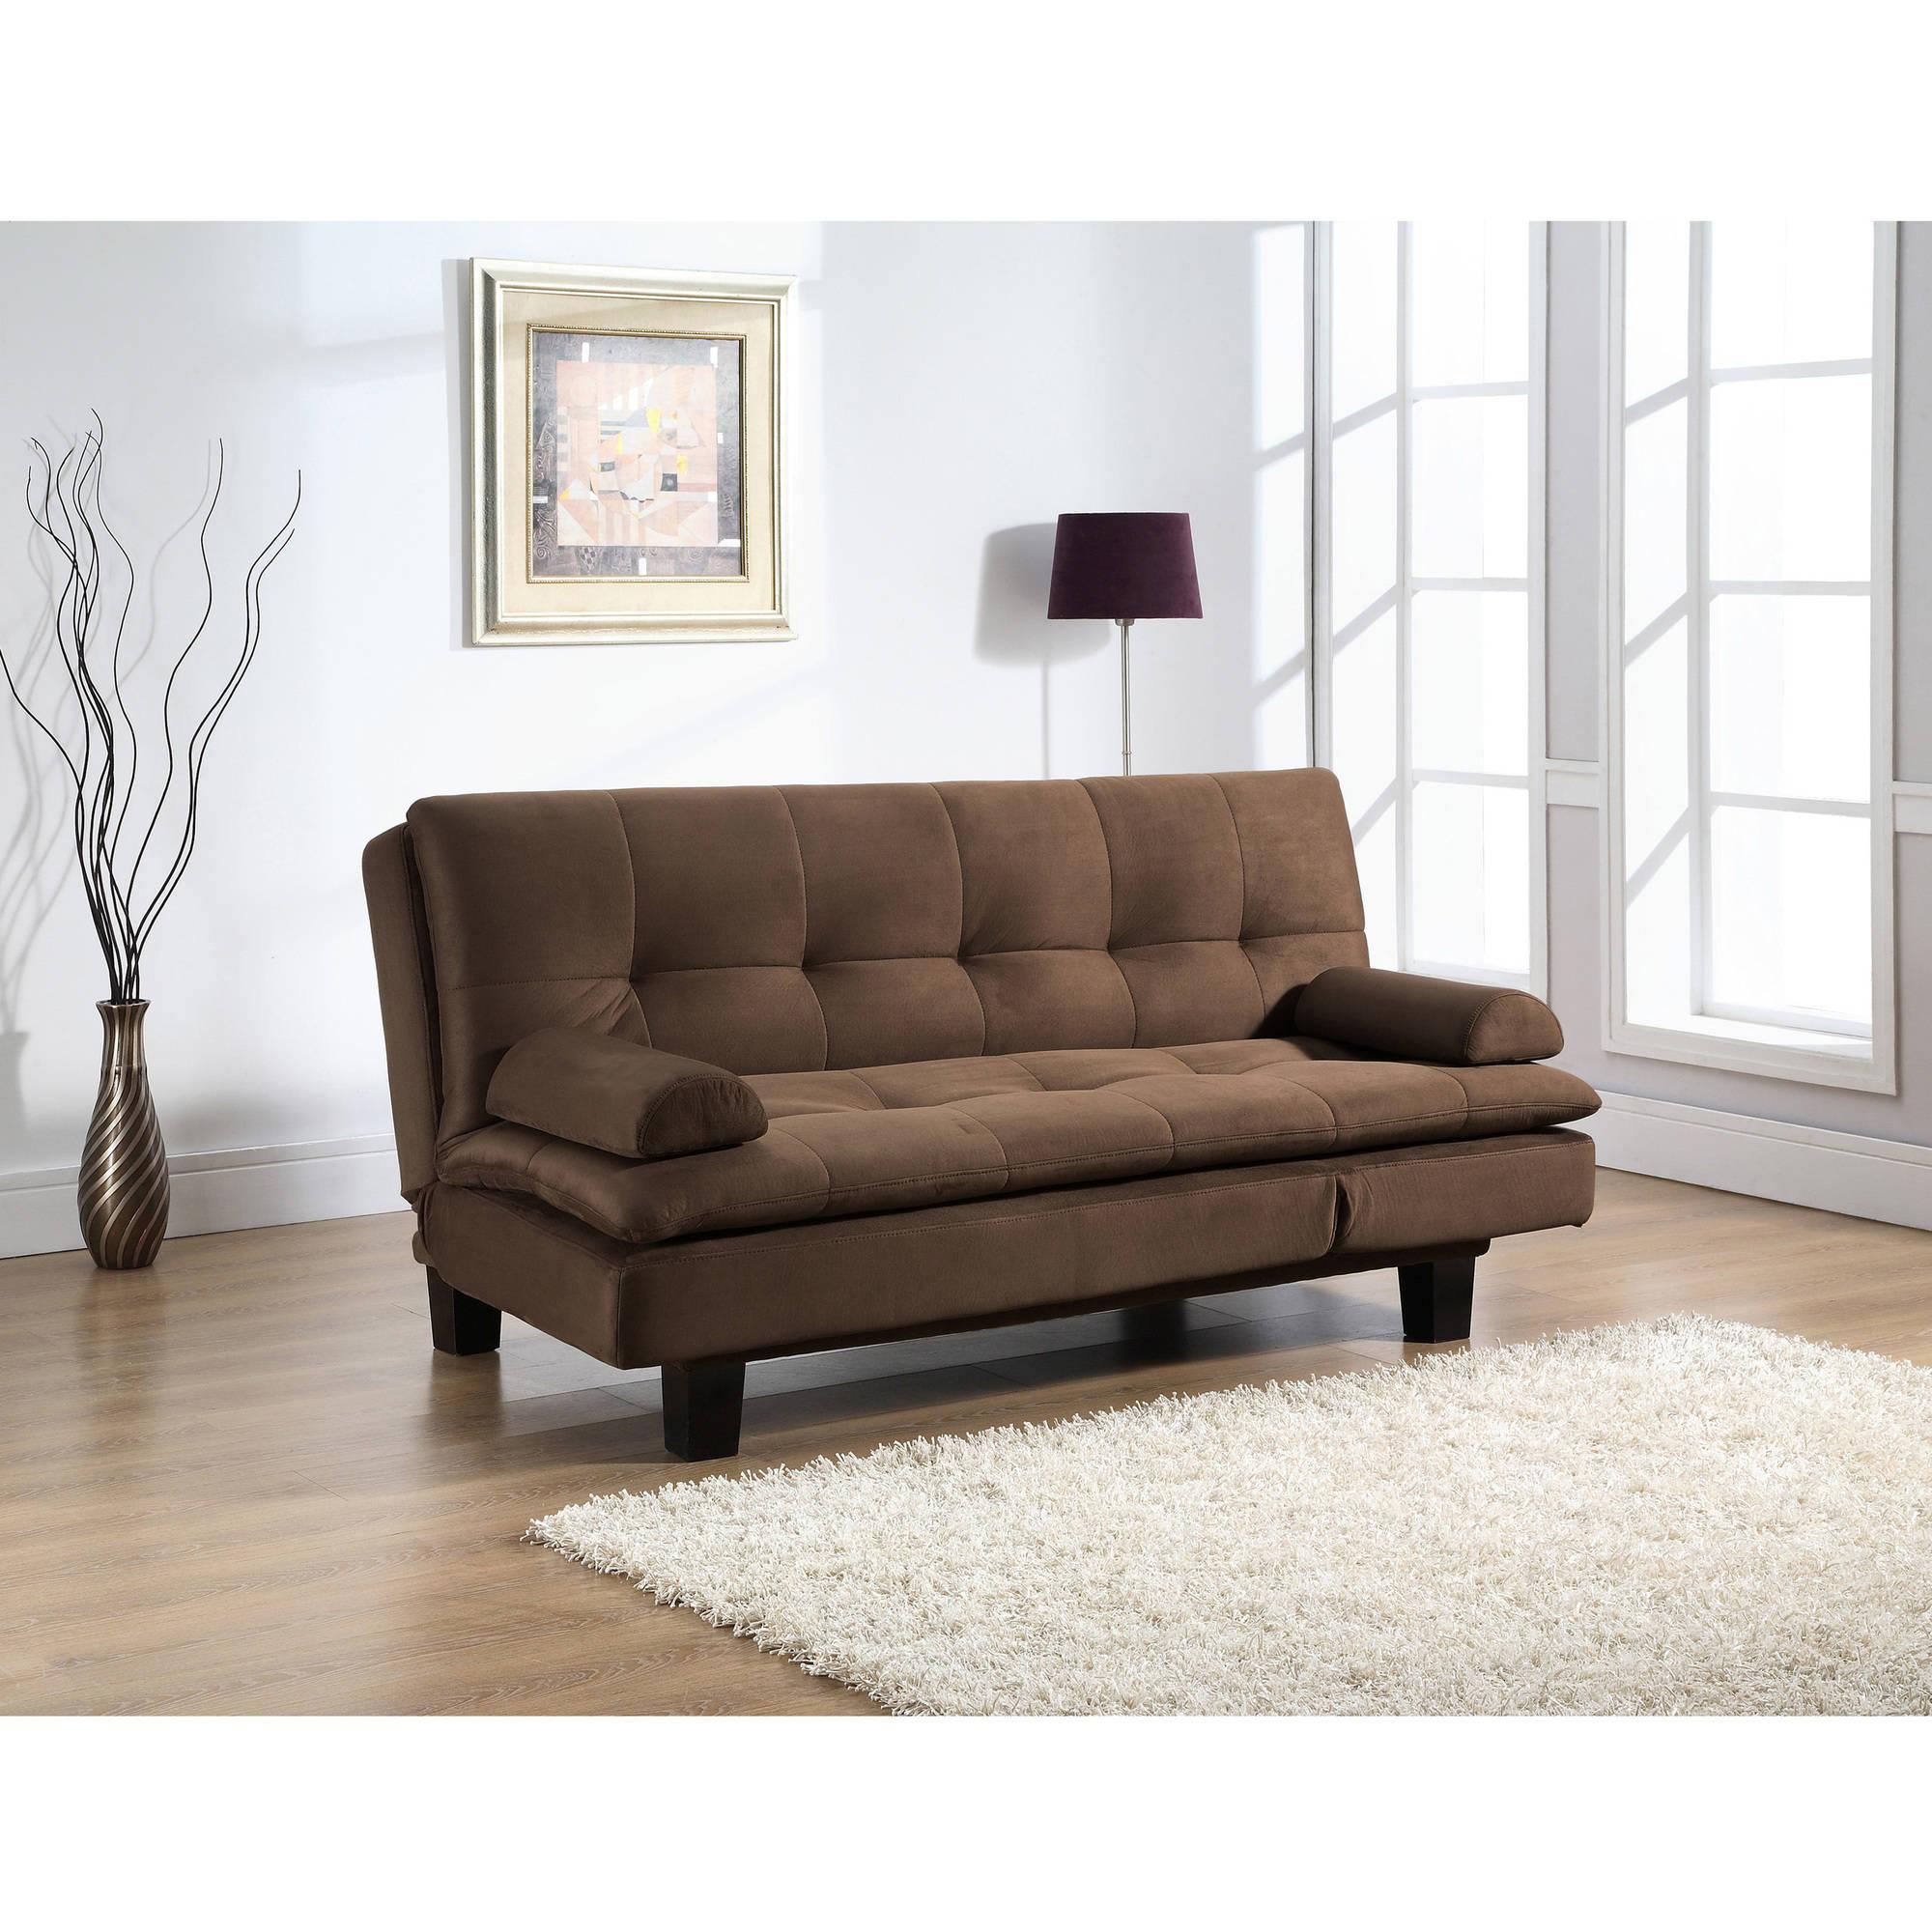 Serta Ainsley Convertible Sofa in Brown Fabric